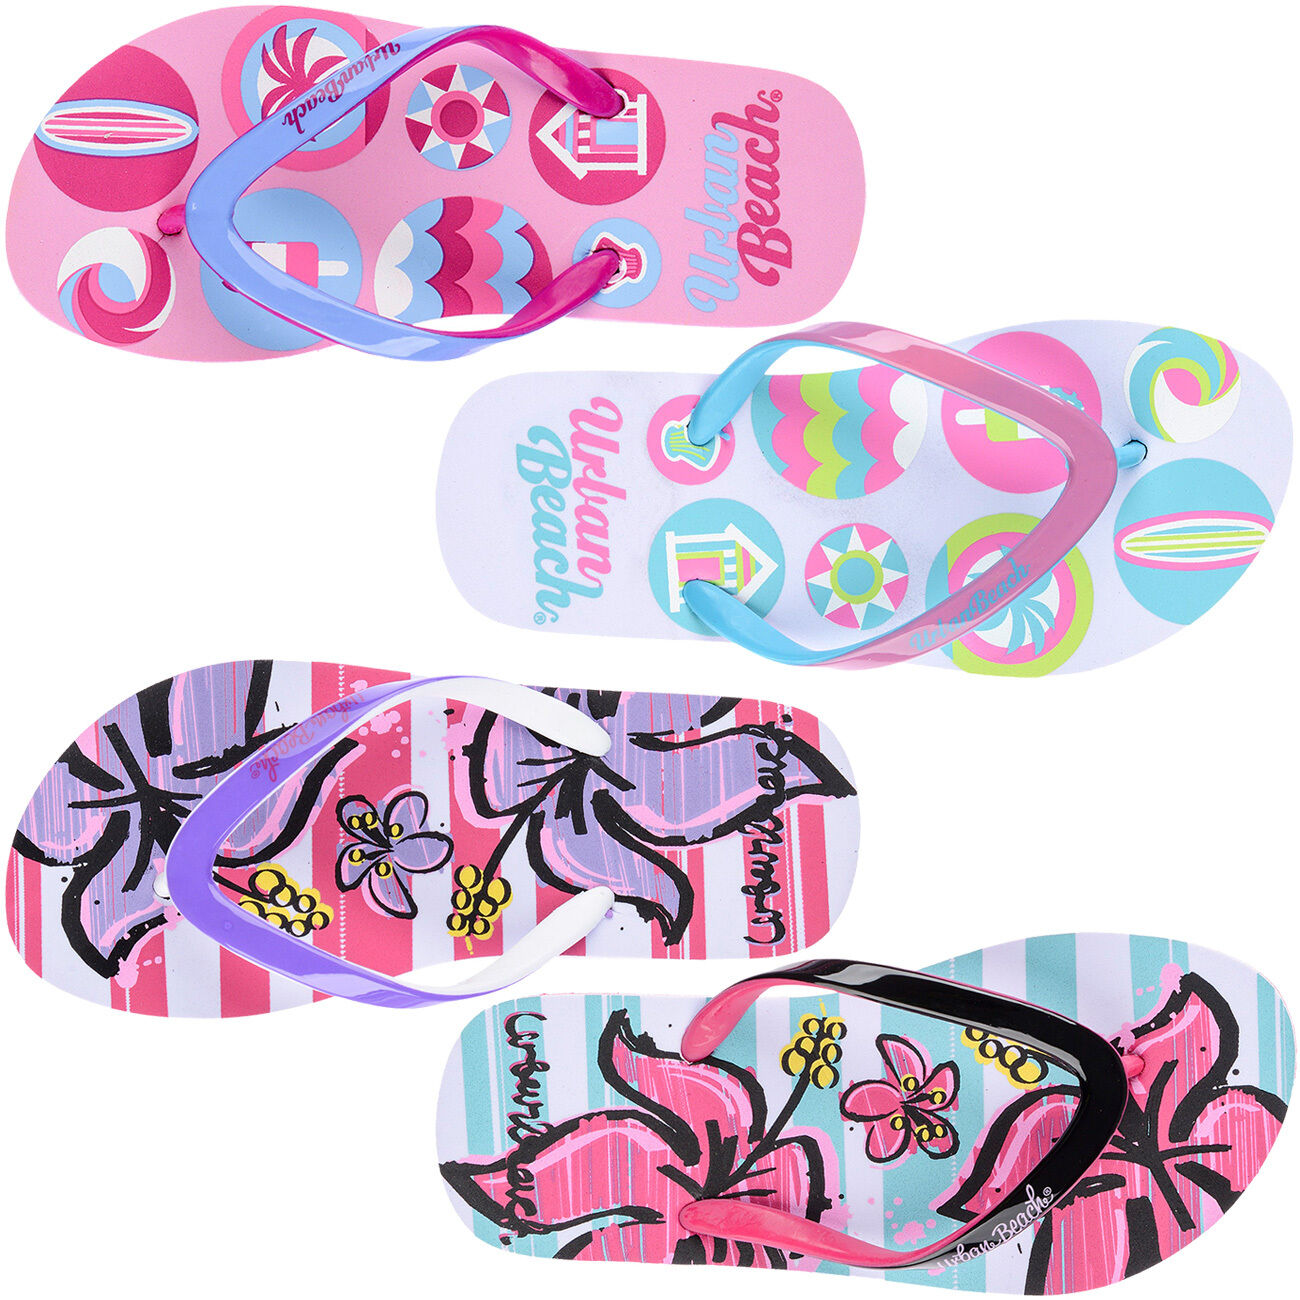 2, White Girls Childrens Printed Sandals Beach Shoe Flip Flop Multi Use